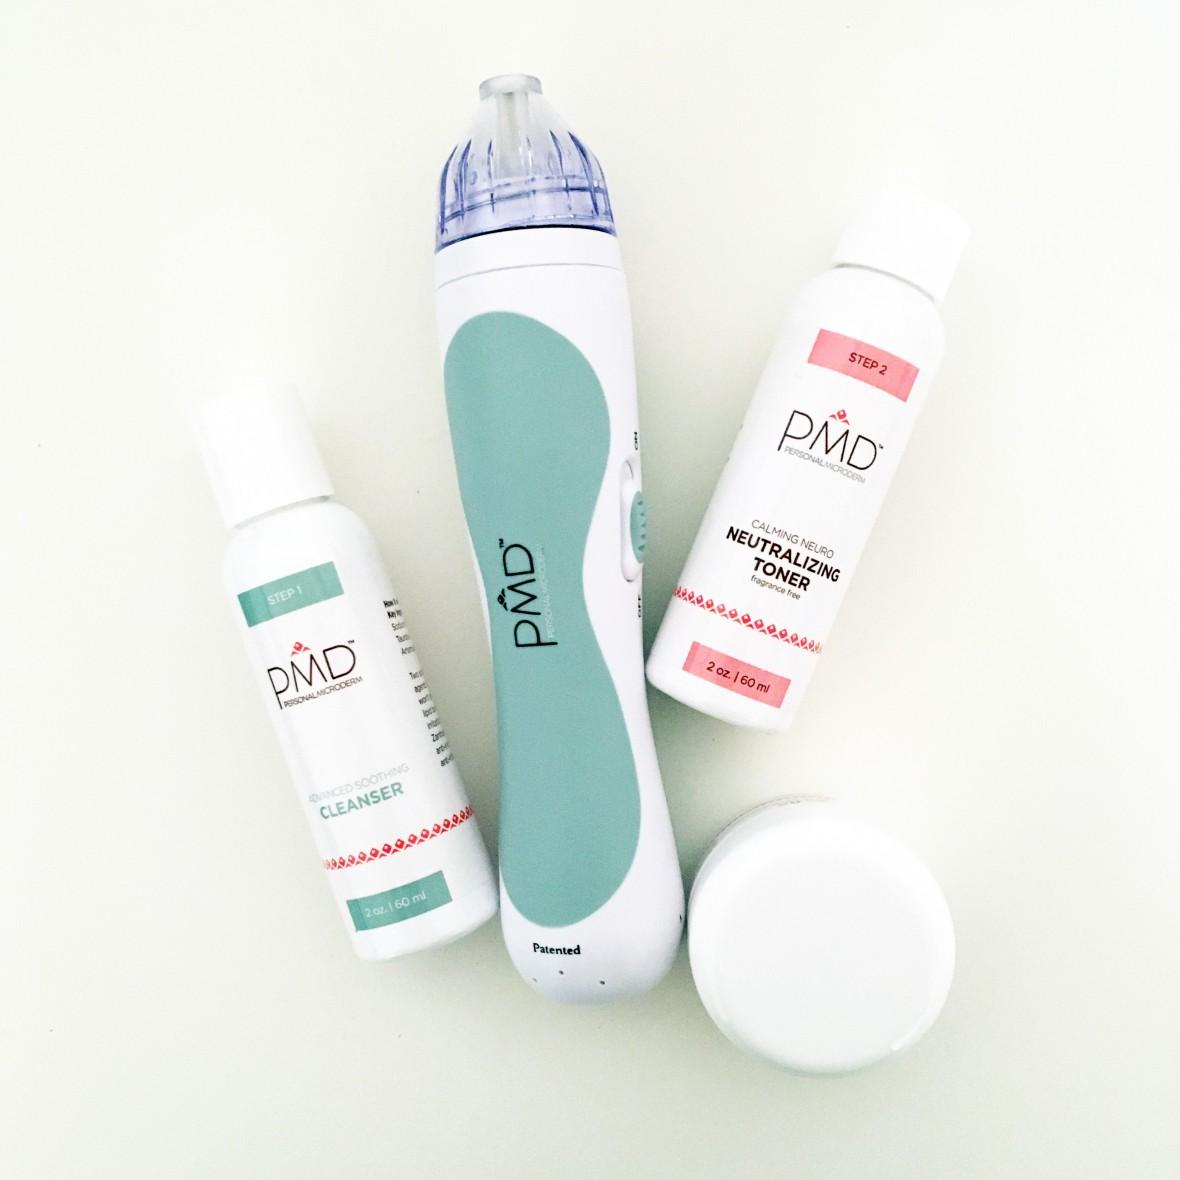 PMD skincare system